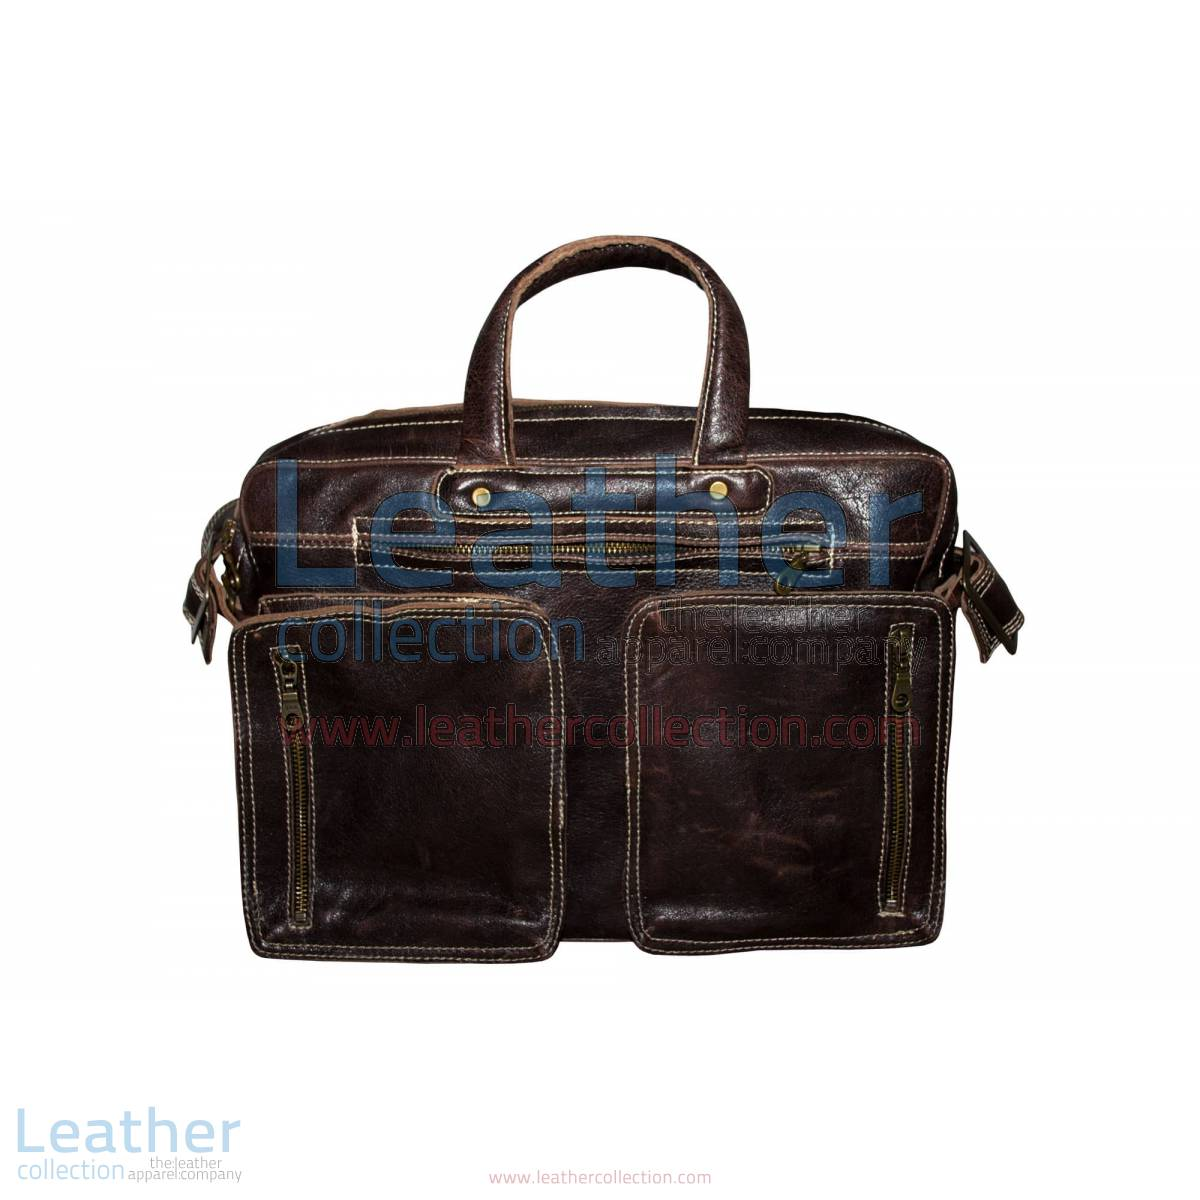 Retro Leather Laptop Bag | leather laptop bag,retro laptop bag